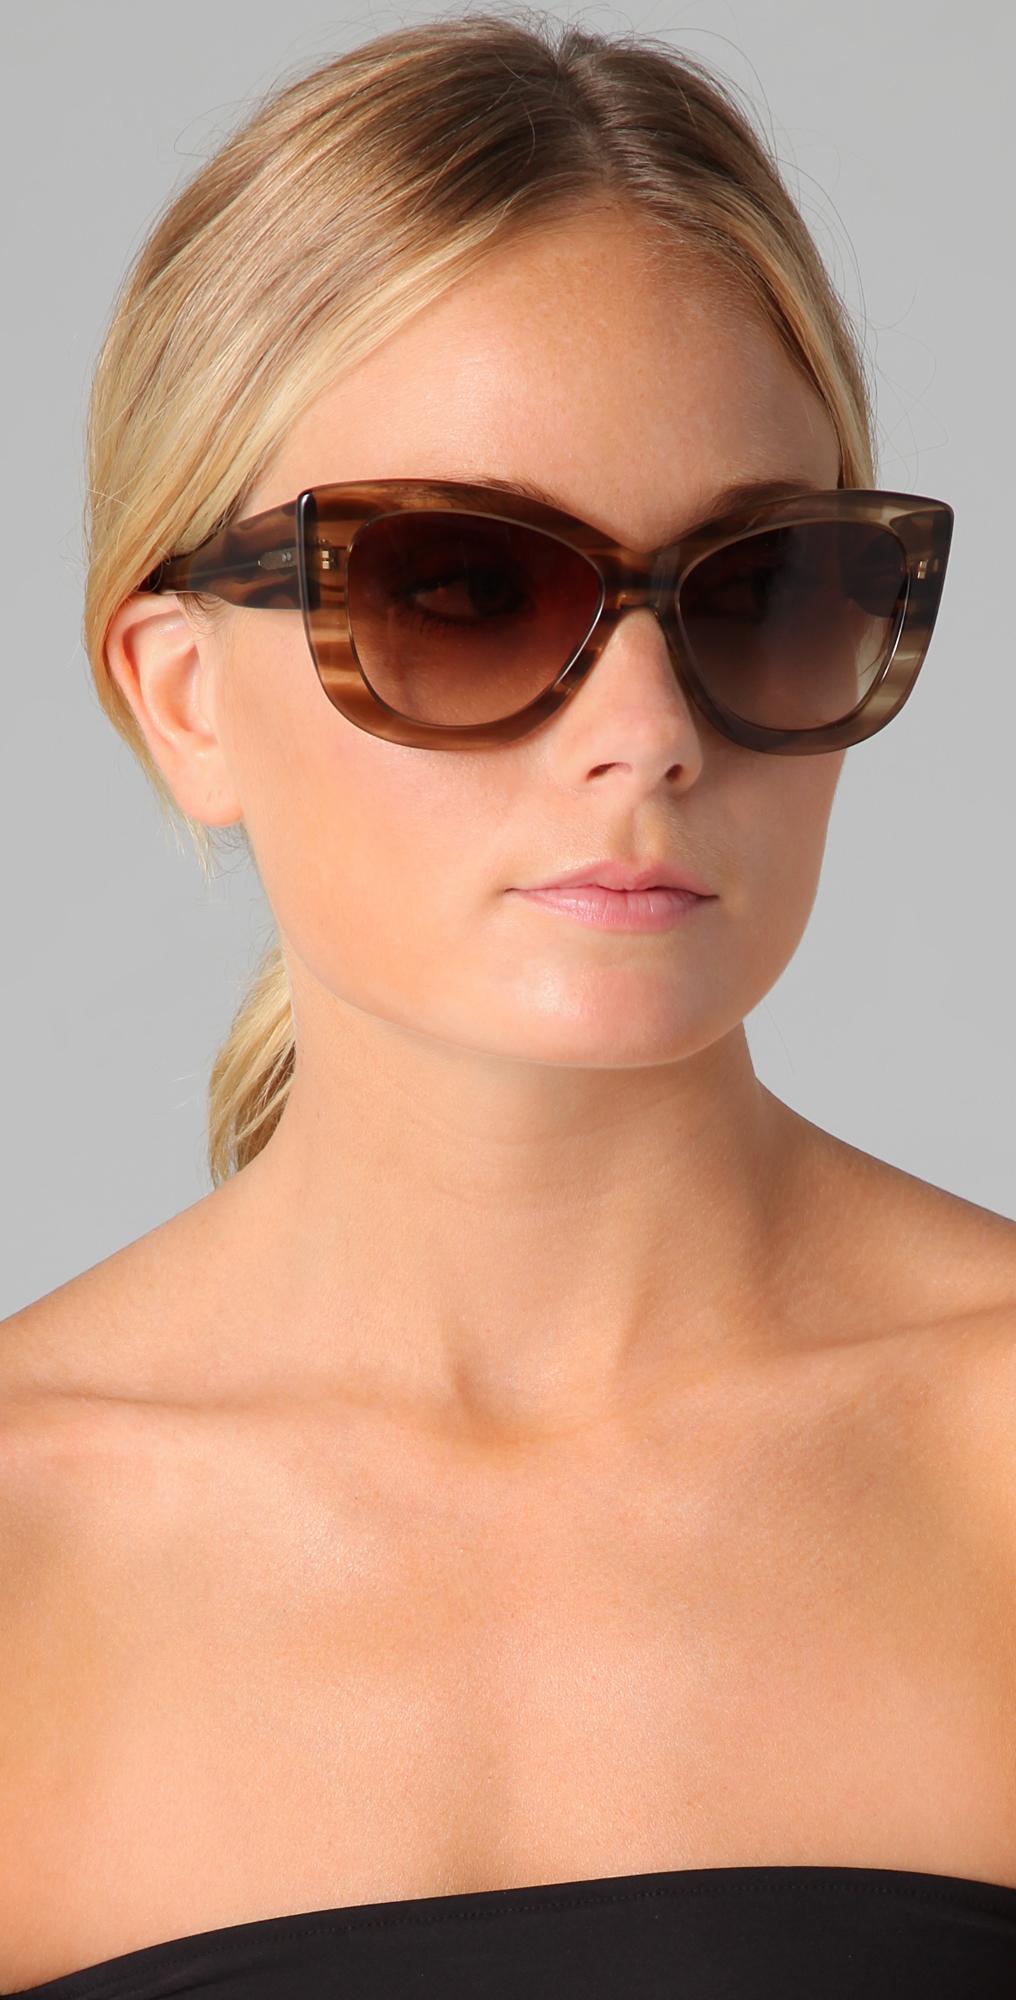 da86334afef Lyst - DITA Vesoul Sunglasses in Brown